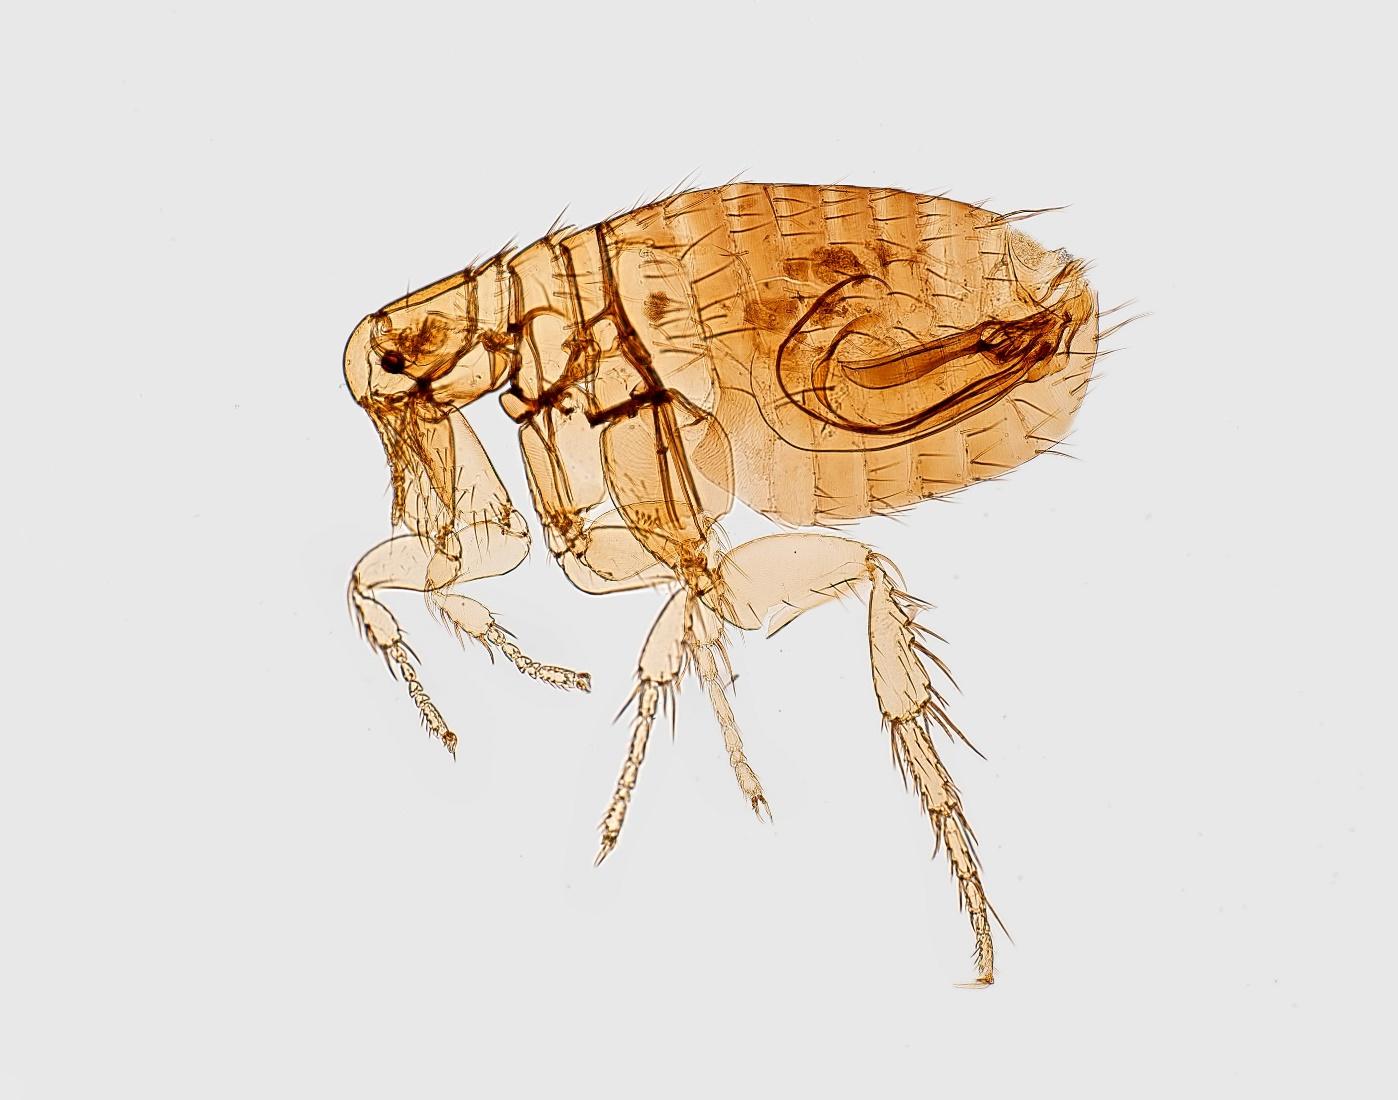 A transparent flea on a white background